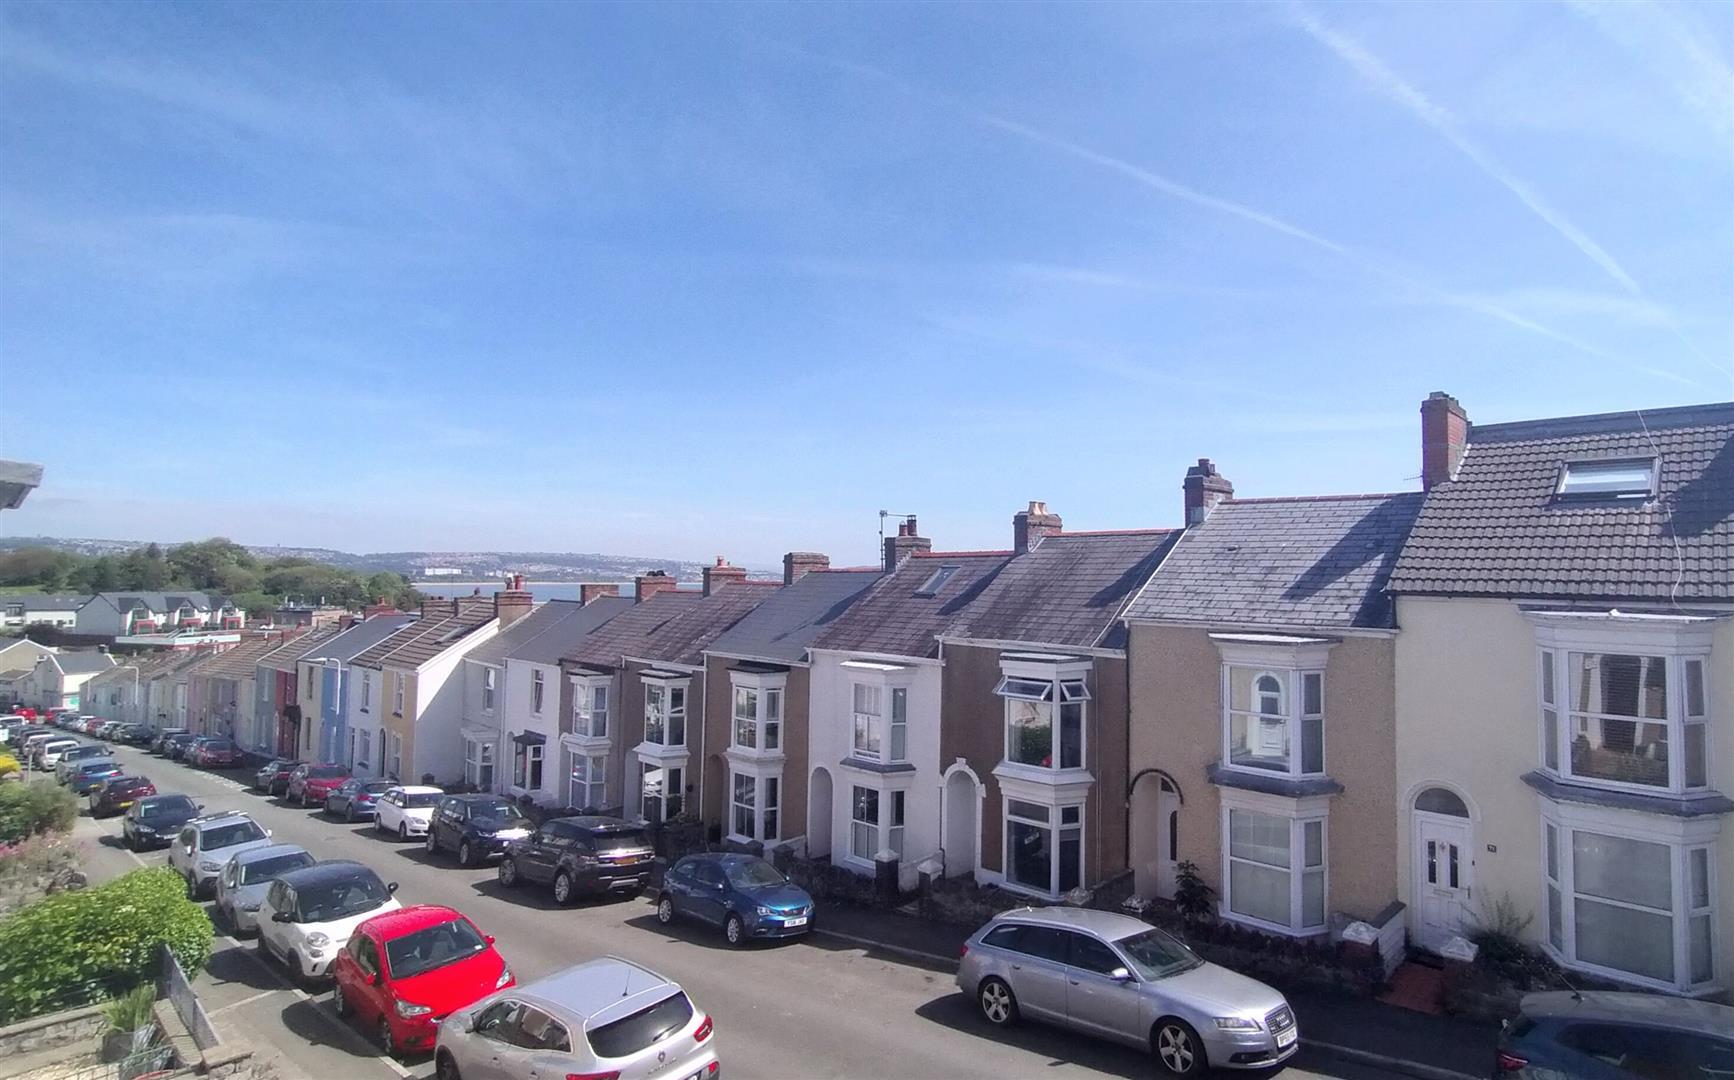 Woodville Road, Mumbles, Swansea, SA3 4AE